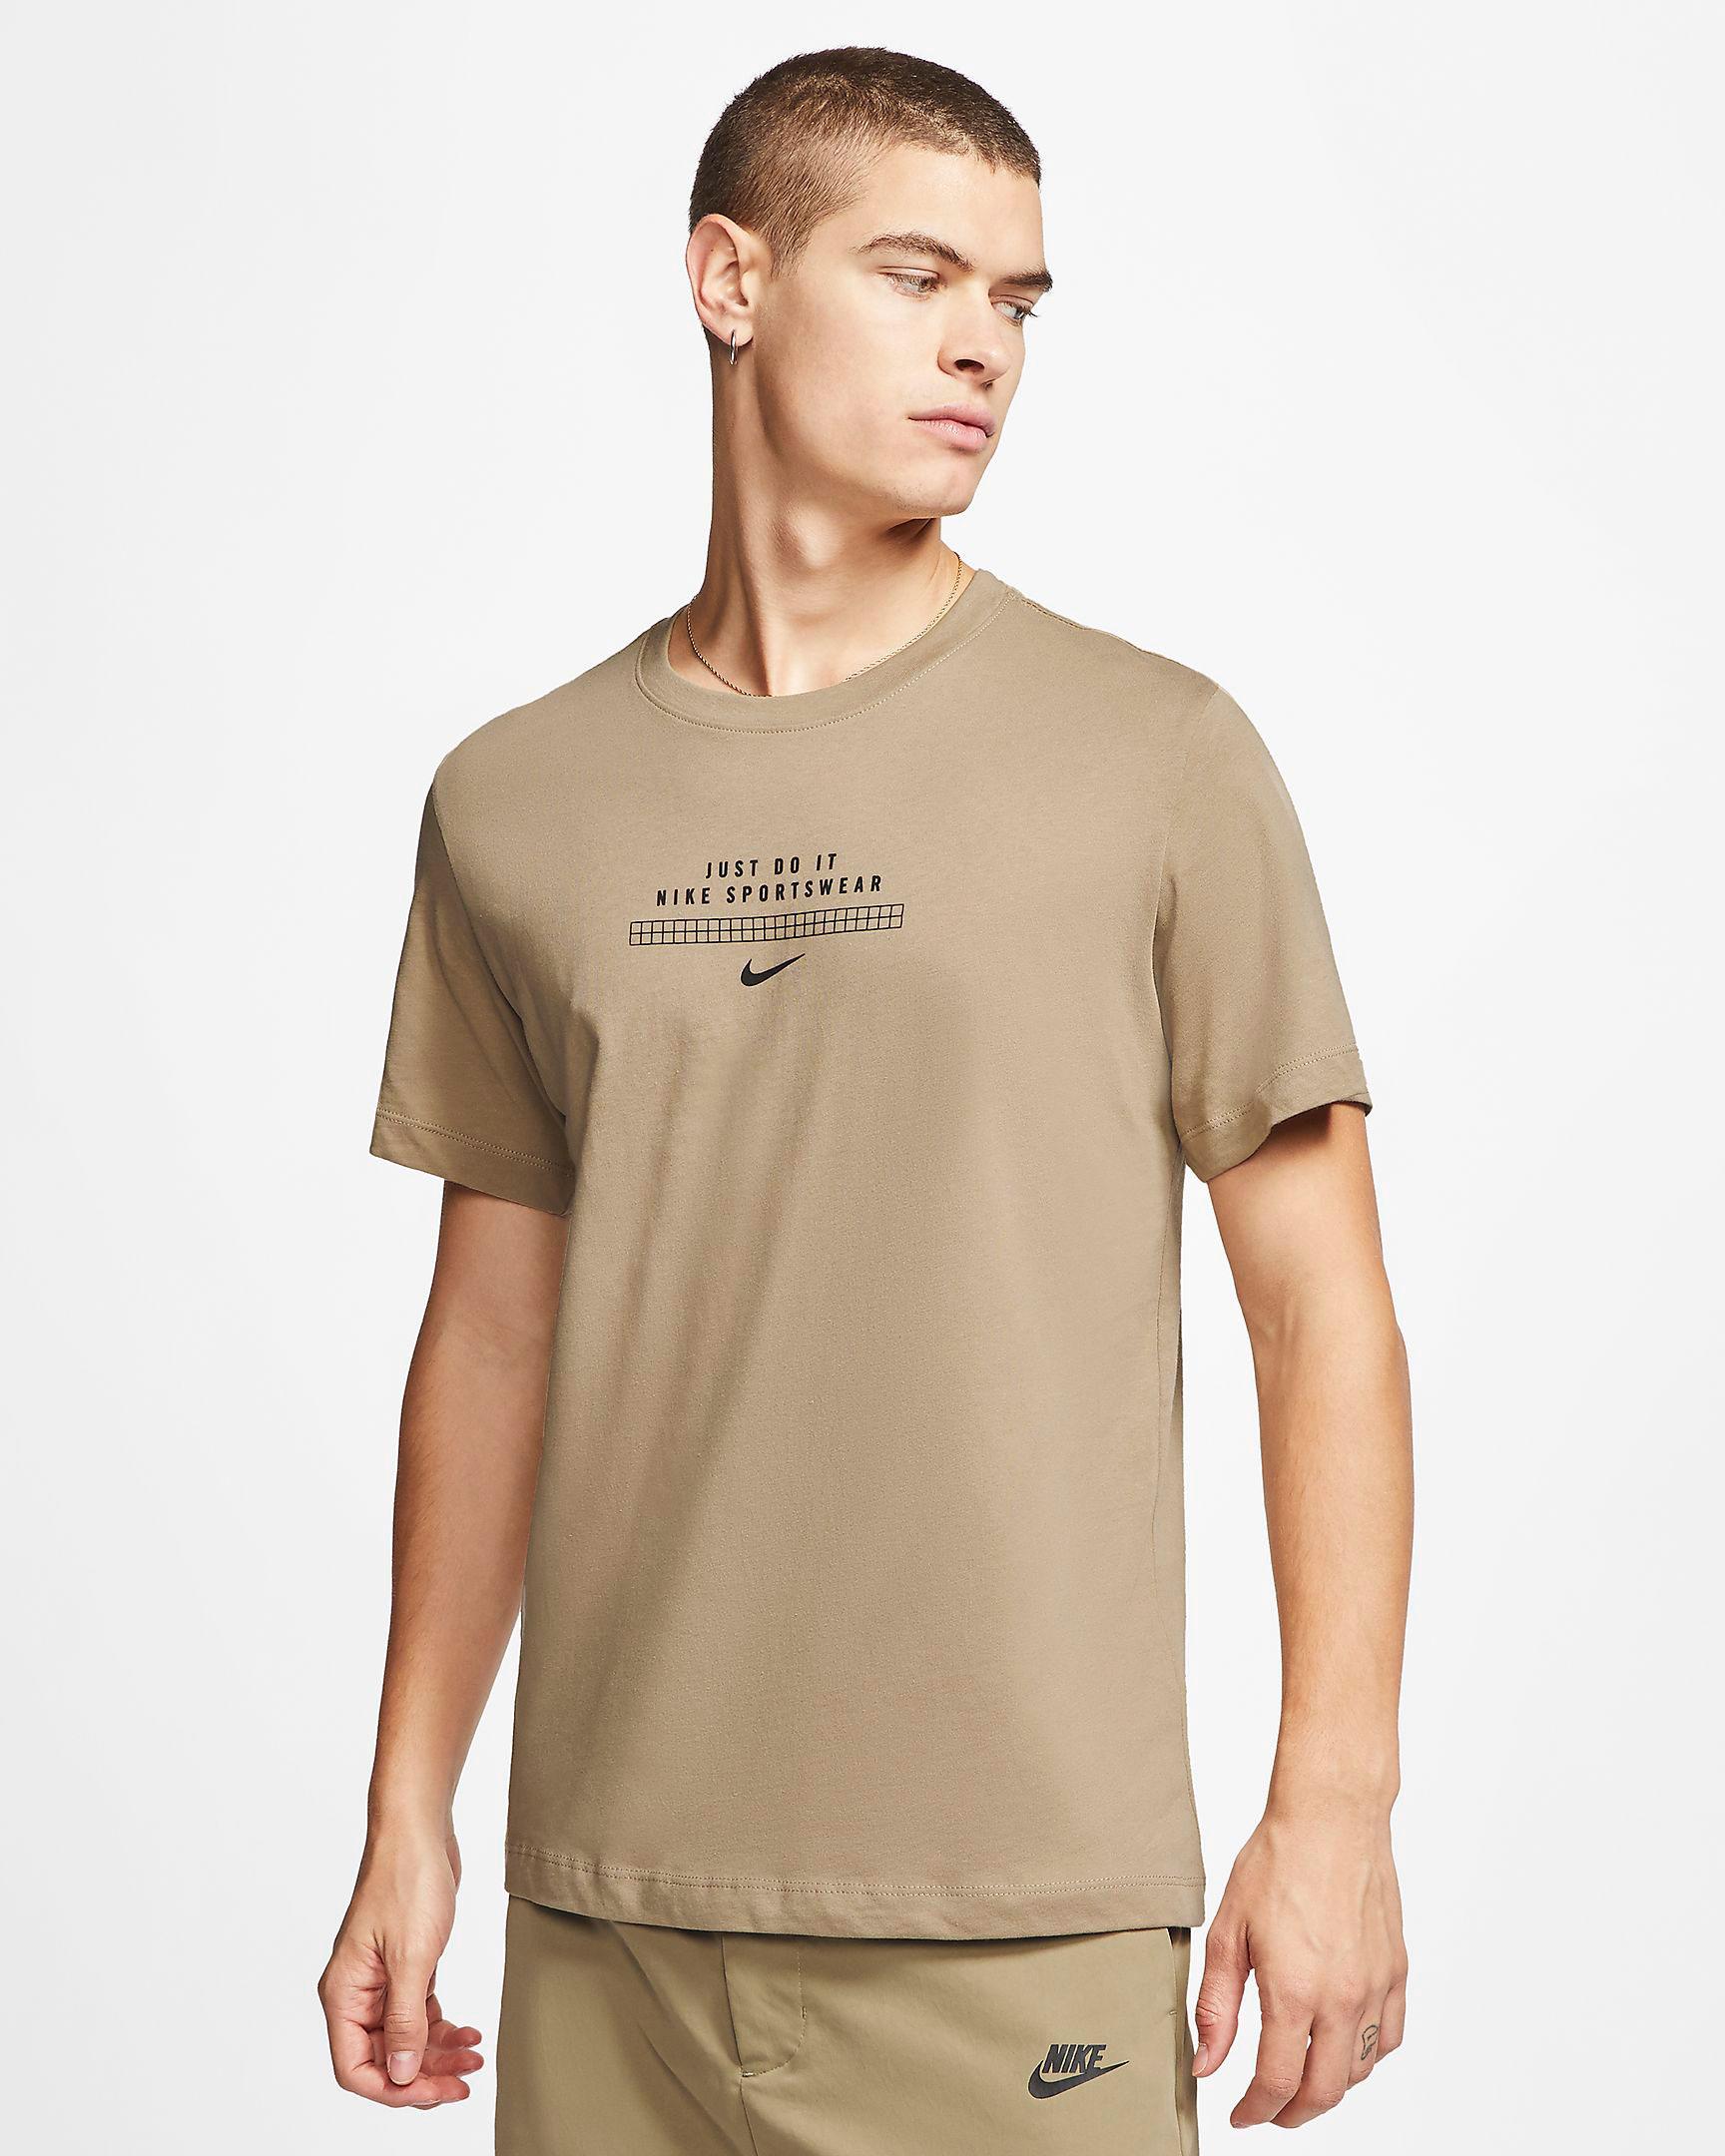 nike-sportswear-khaki-shirt